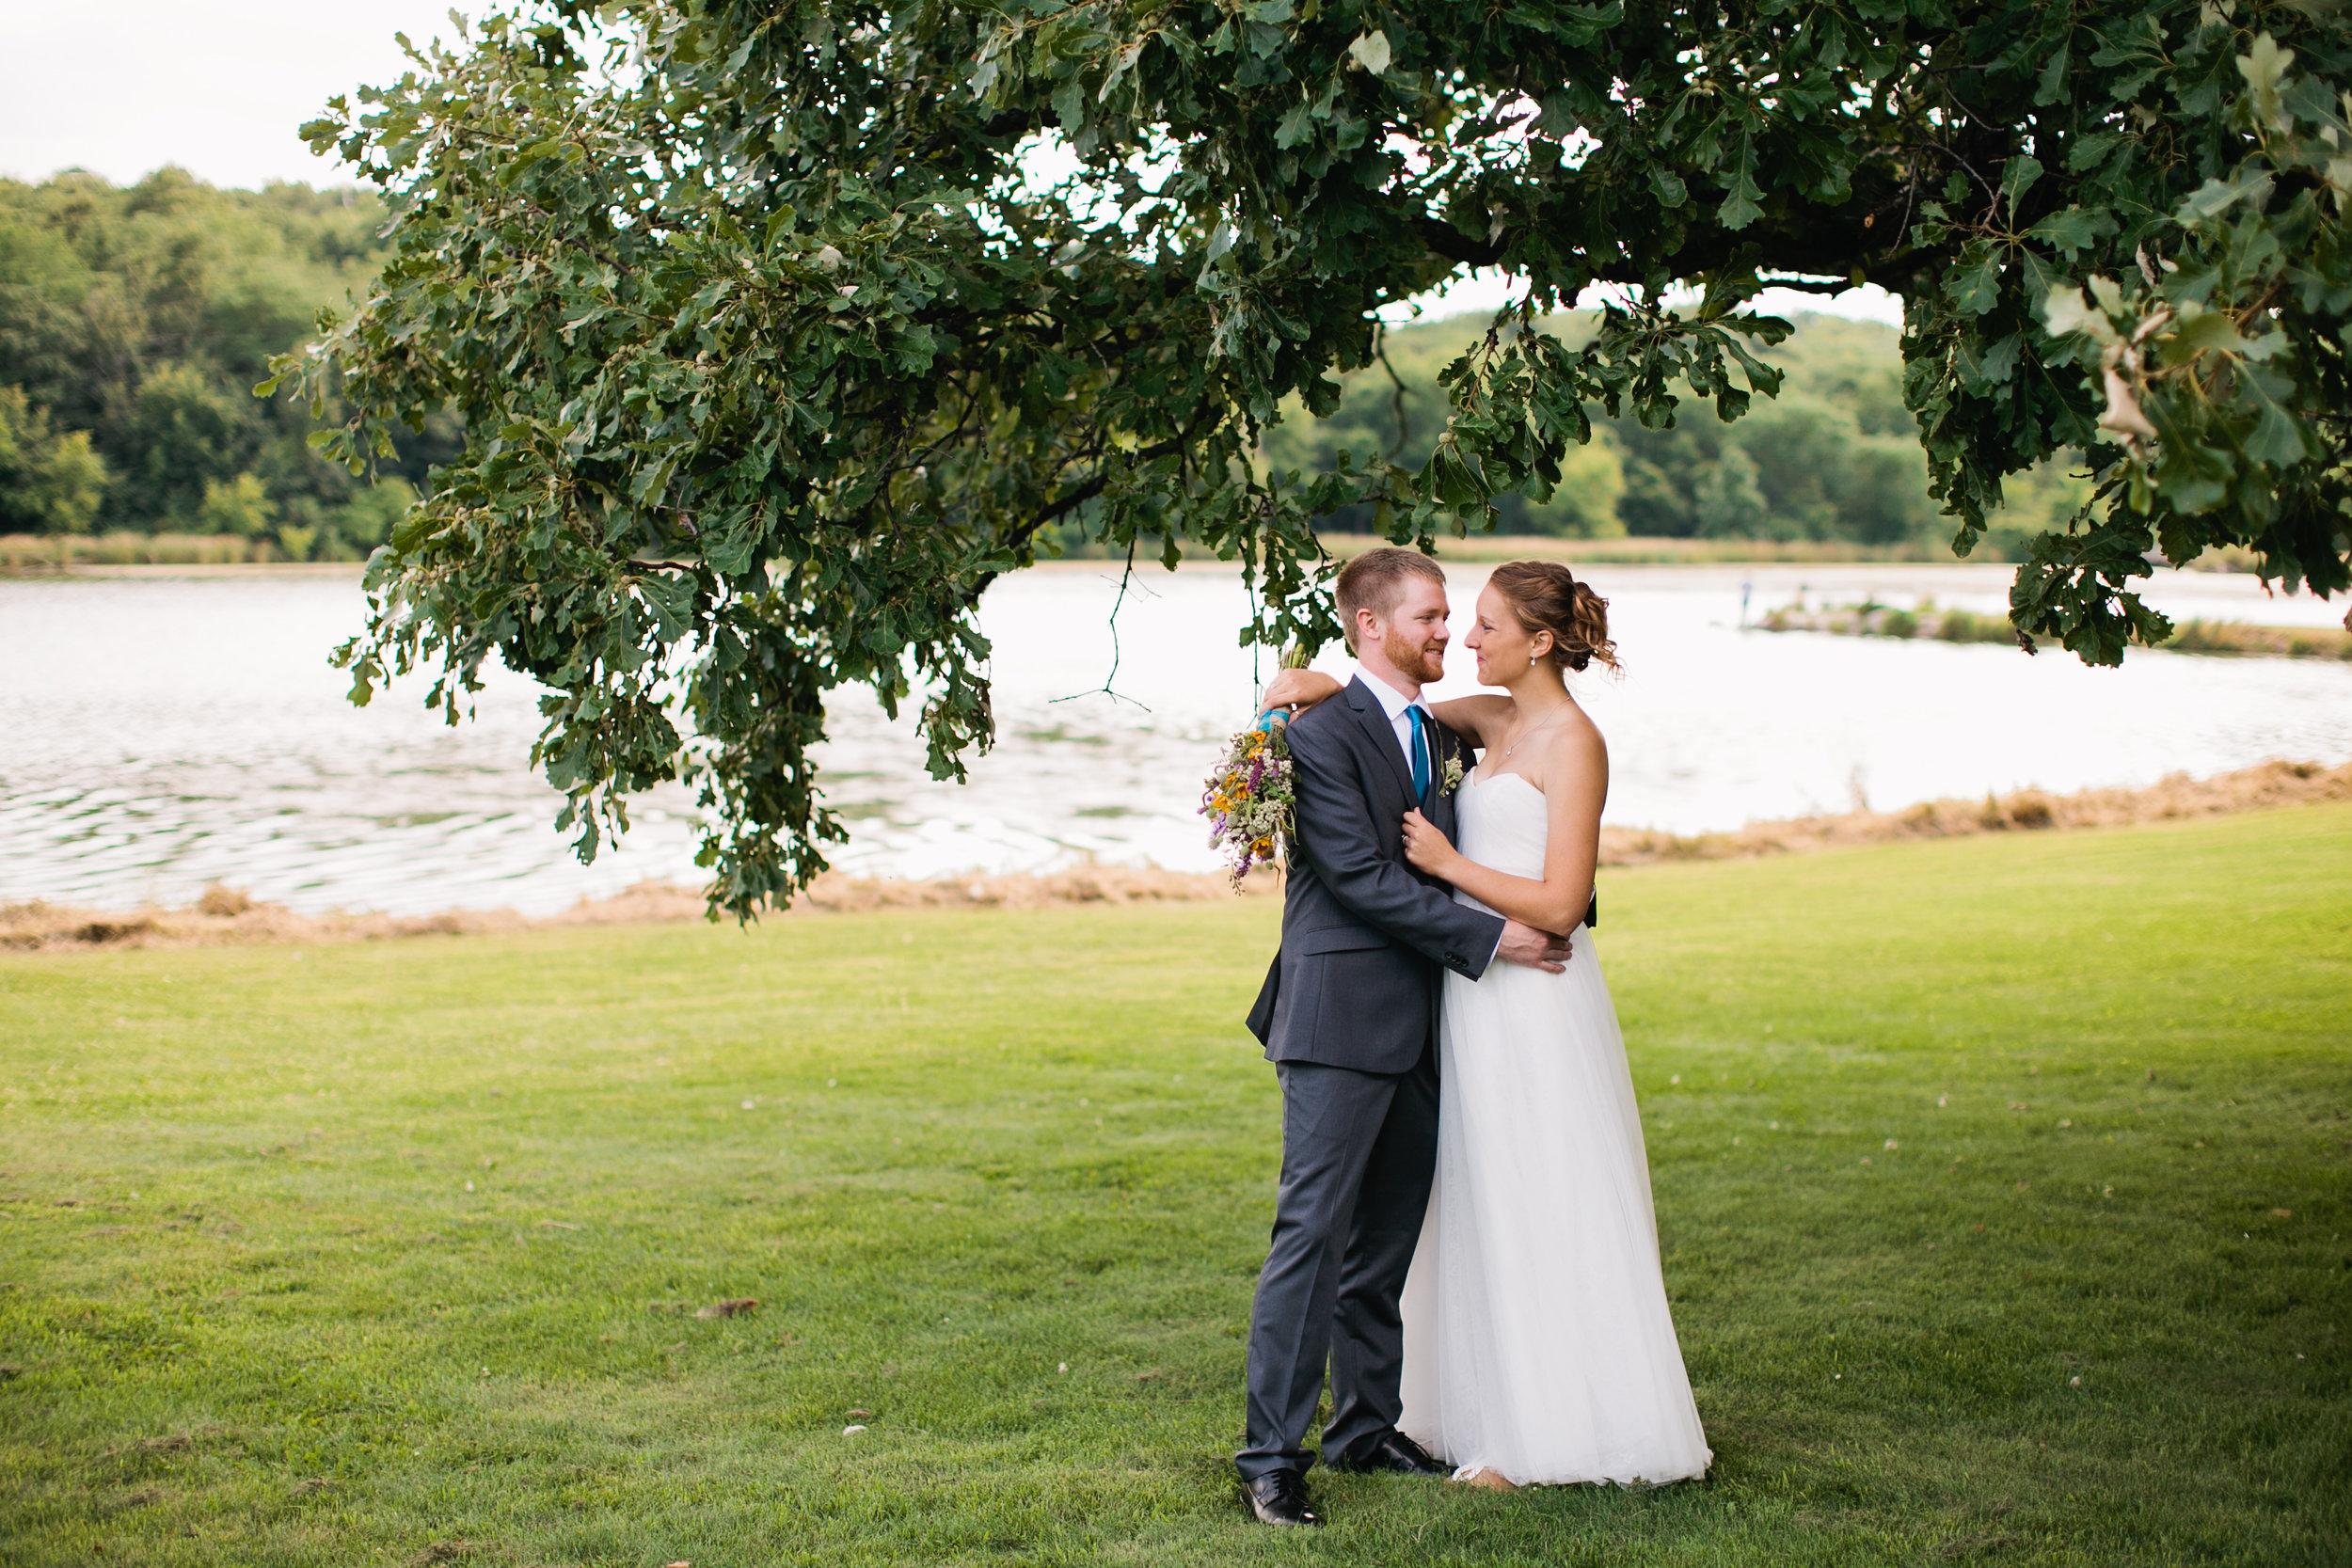 wedding photos by water at hickory hills park la porte city iowa